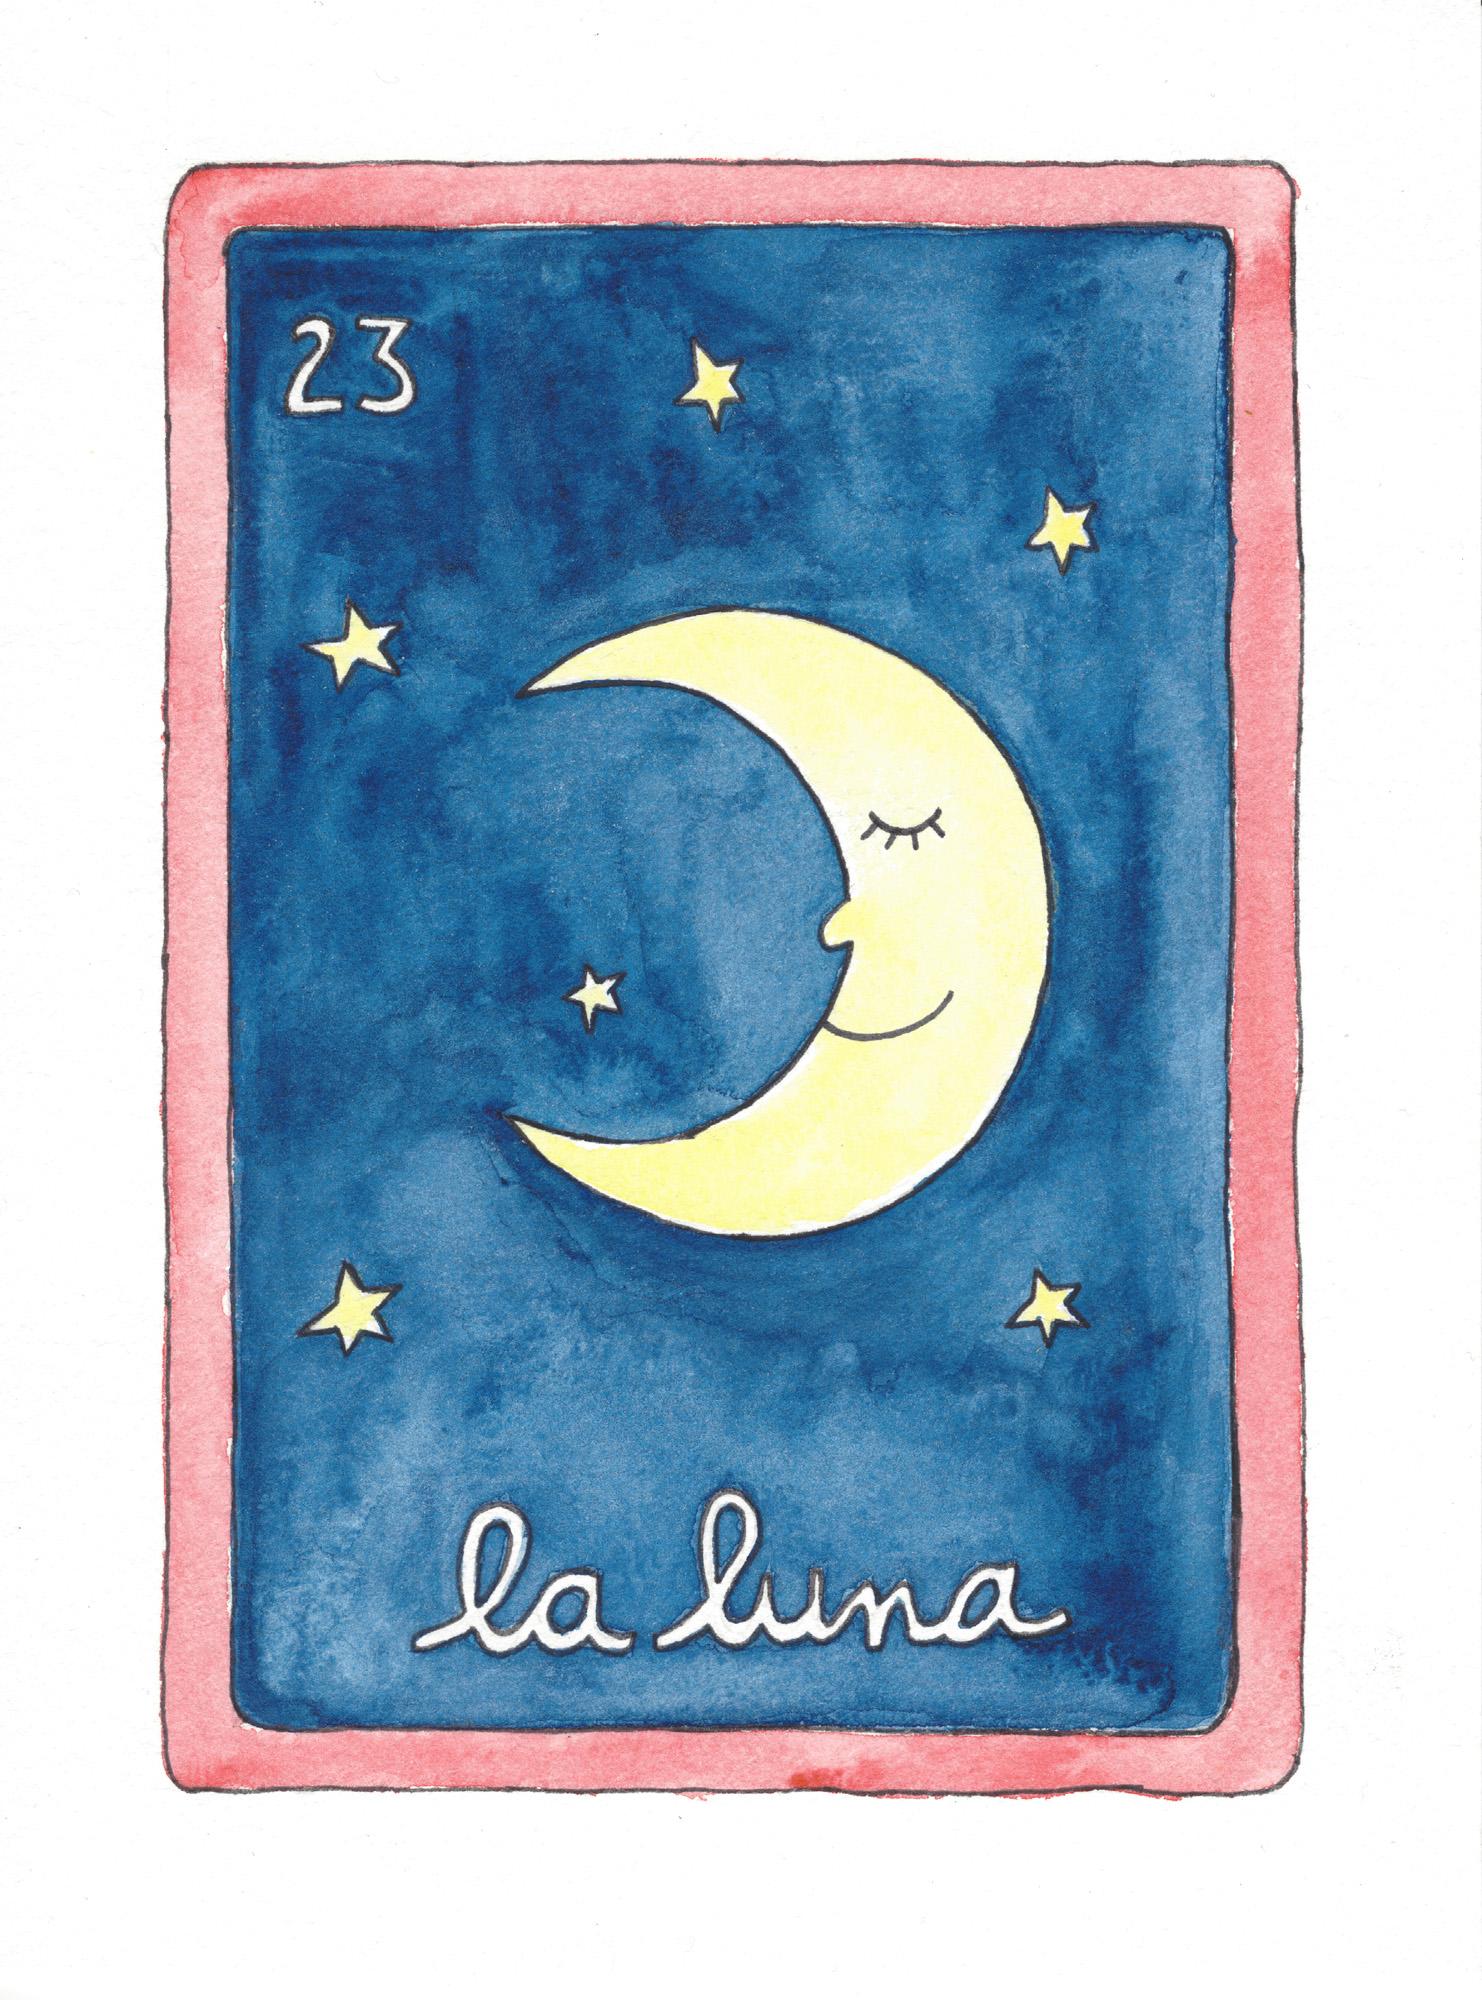 La-Luna-Loteria-Print-the-moon-watercolor-elisemade-by-elise-lopez.jpg